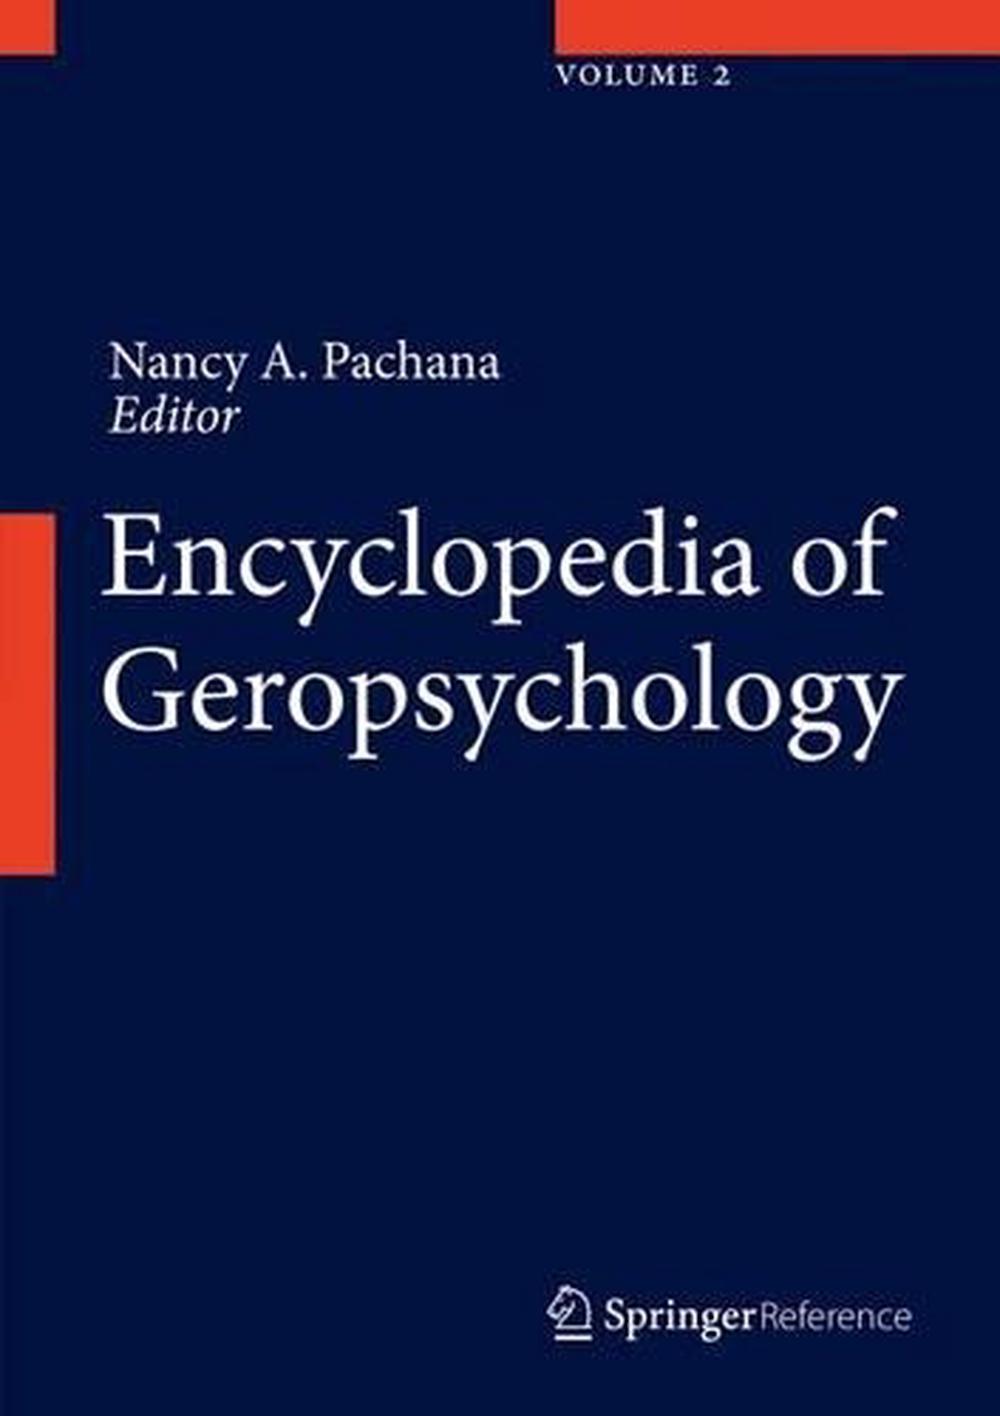 Encyclopedia of Geropsychology